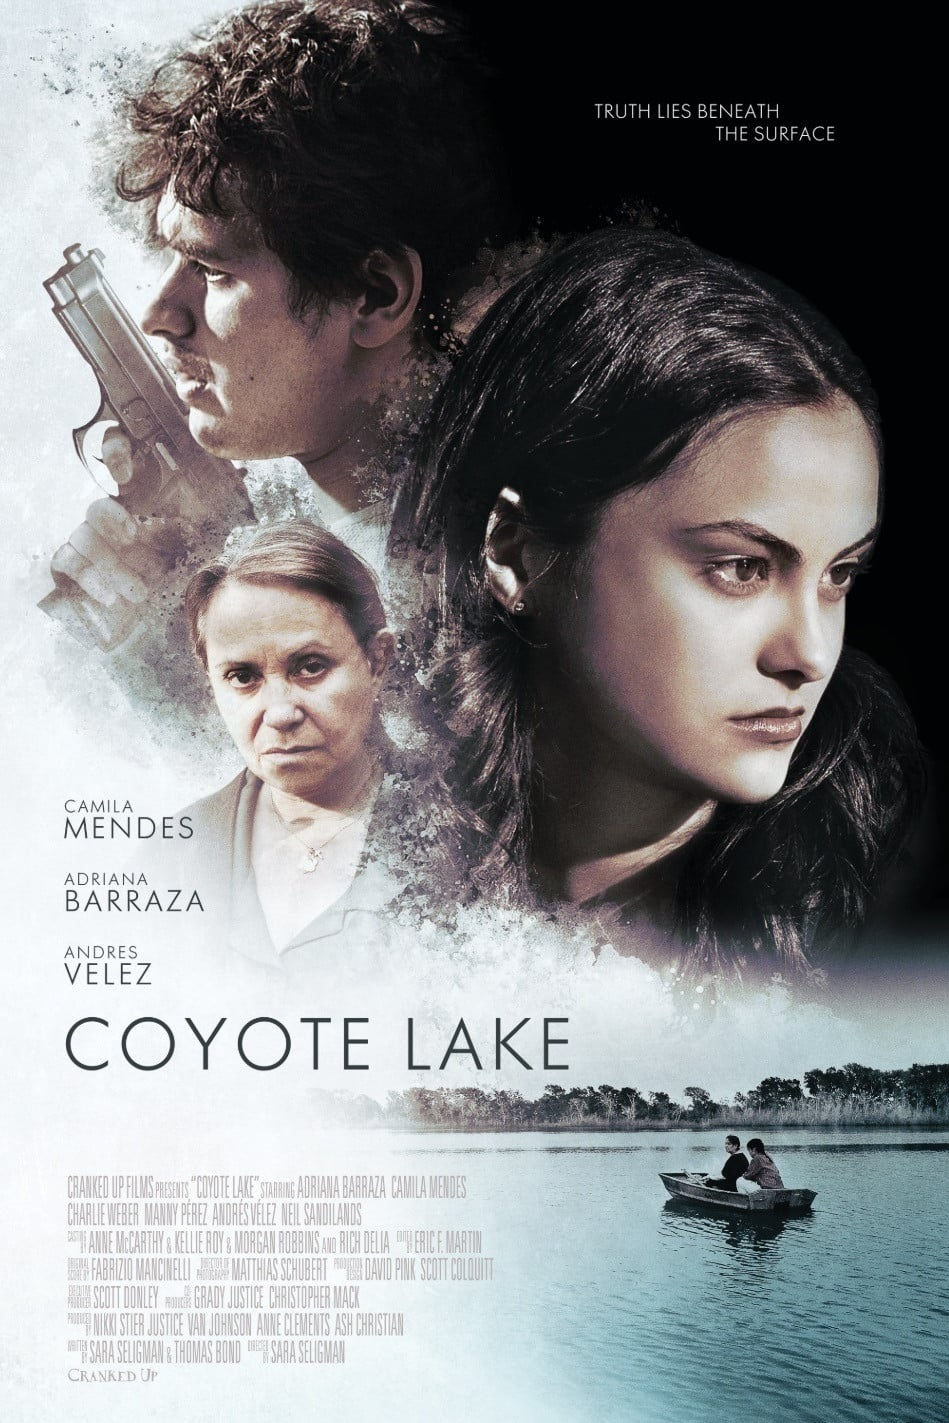 Coyote Lake Camila Mendes Poster